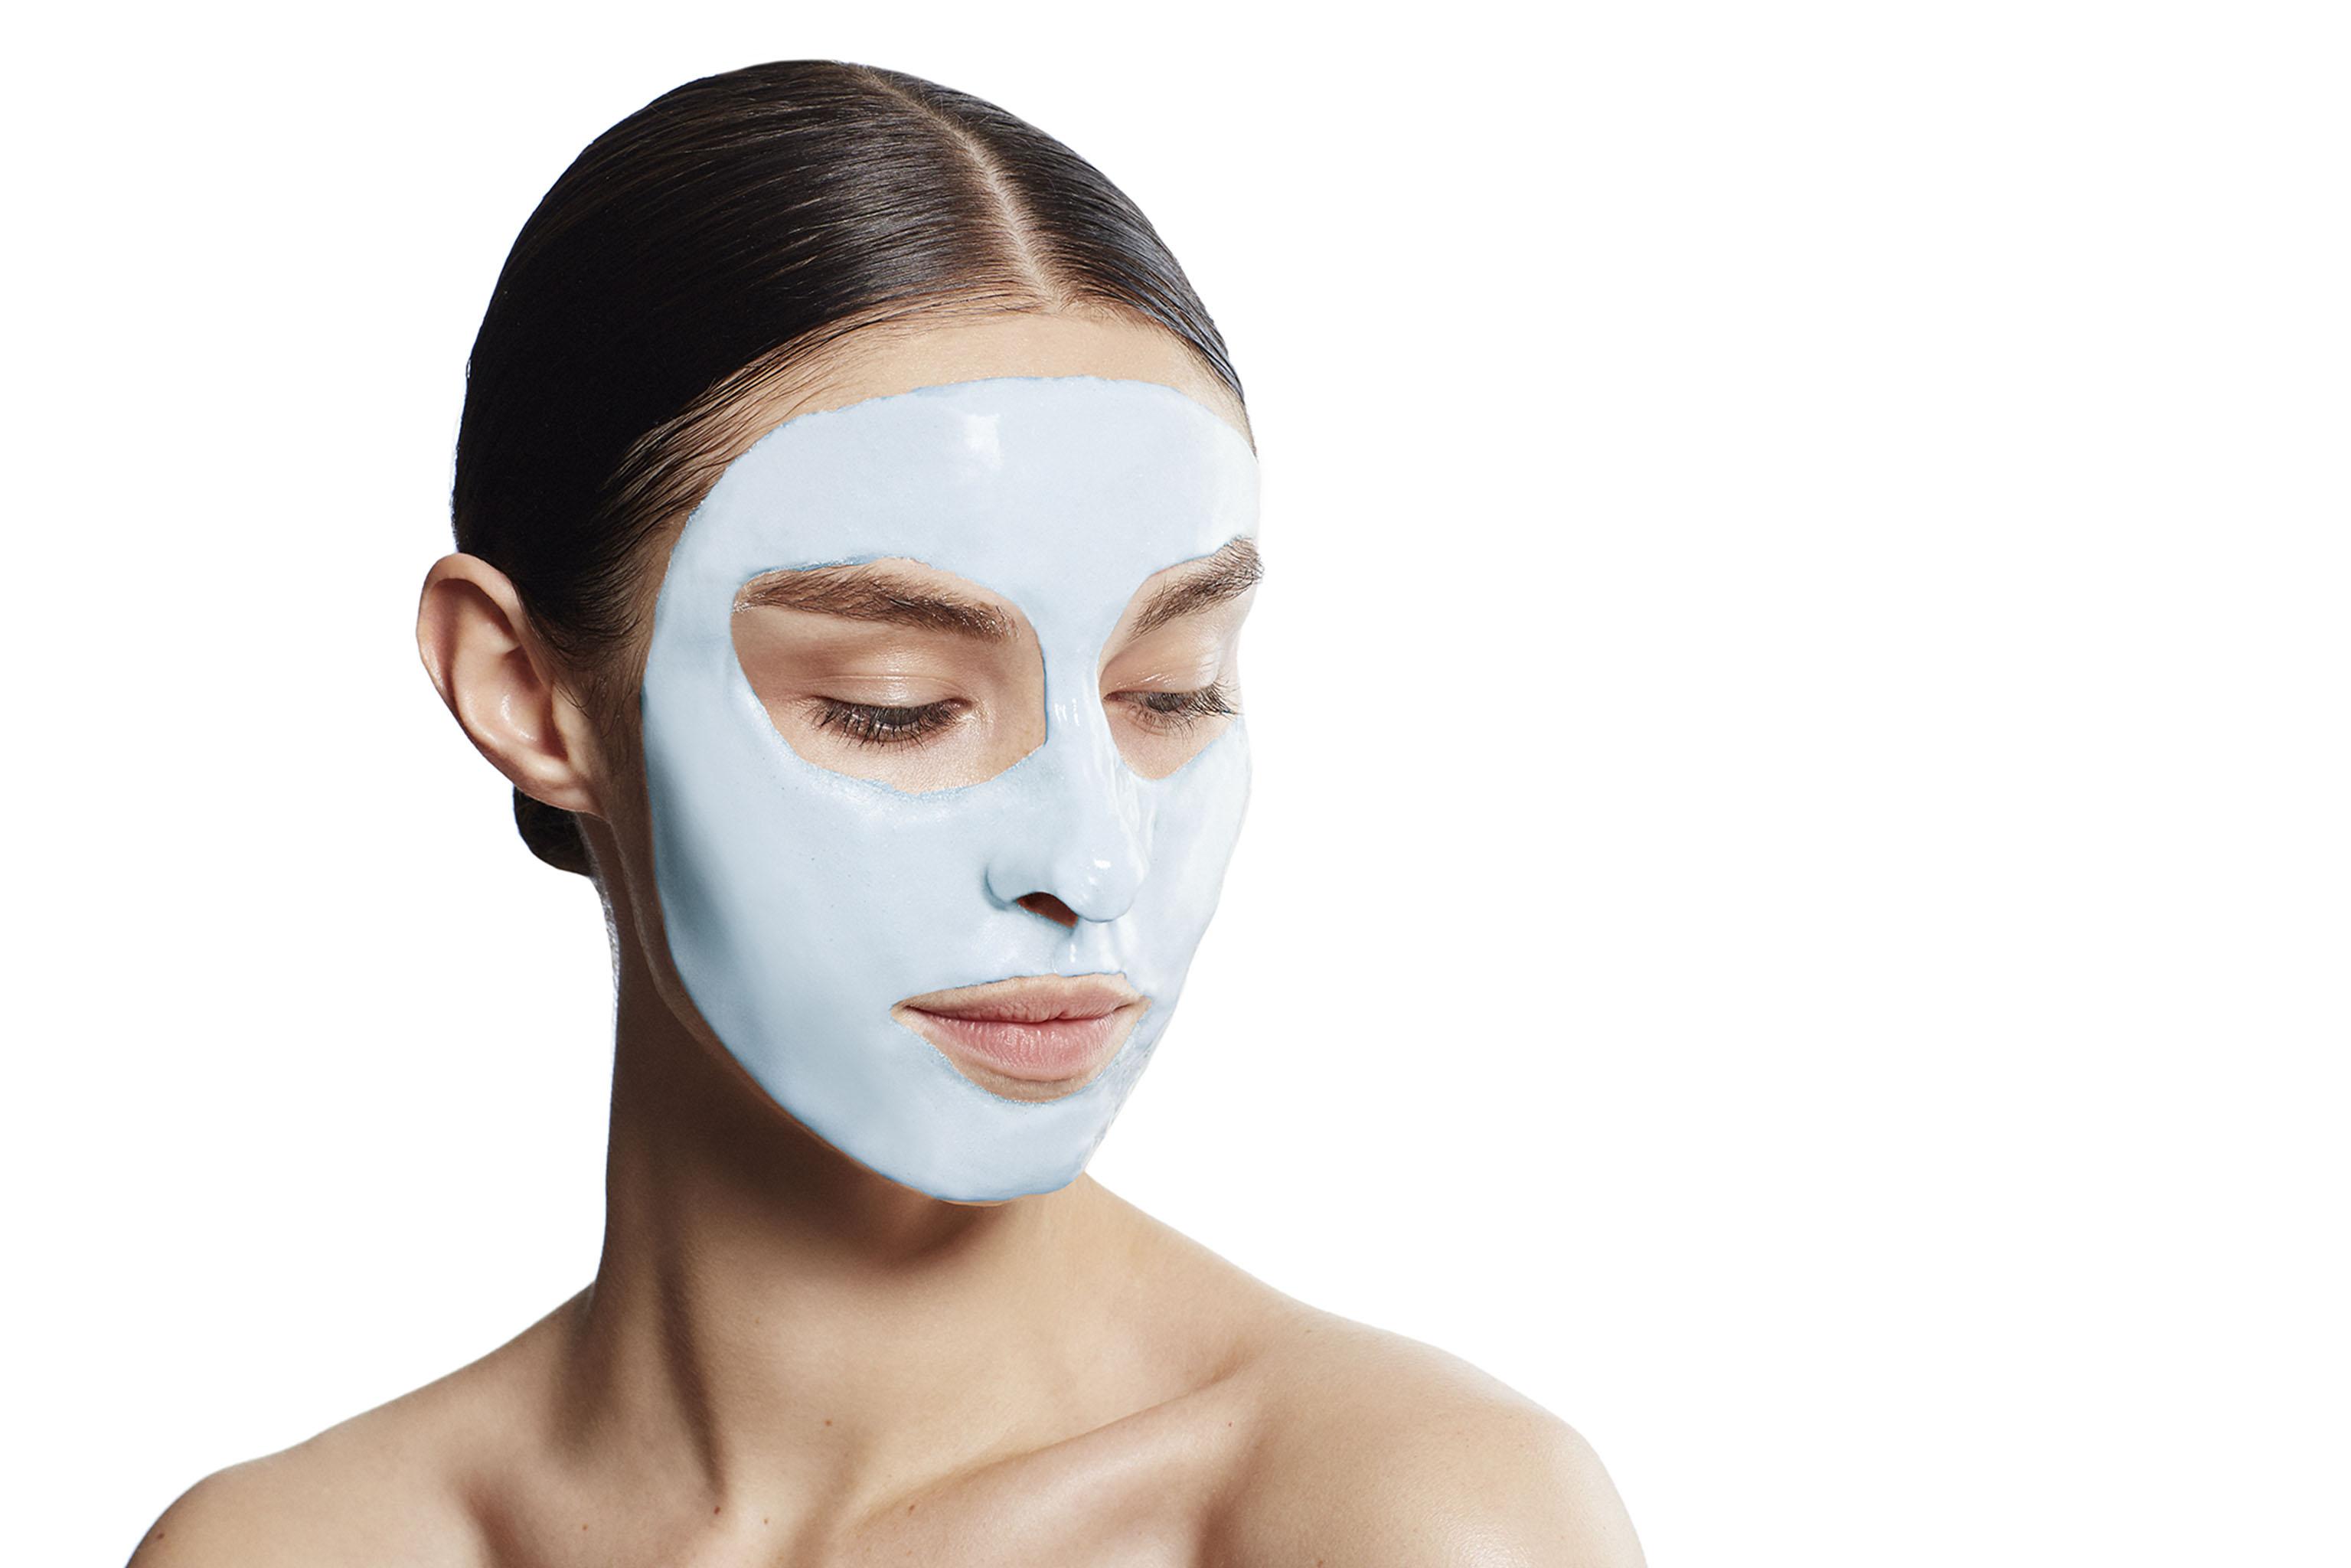 Erno Laszlo's Firmarine Lift Face Powder Mask.